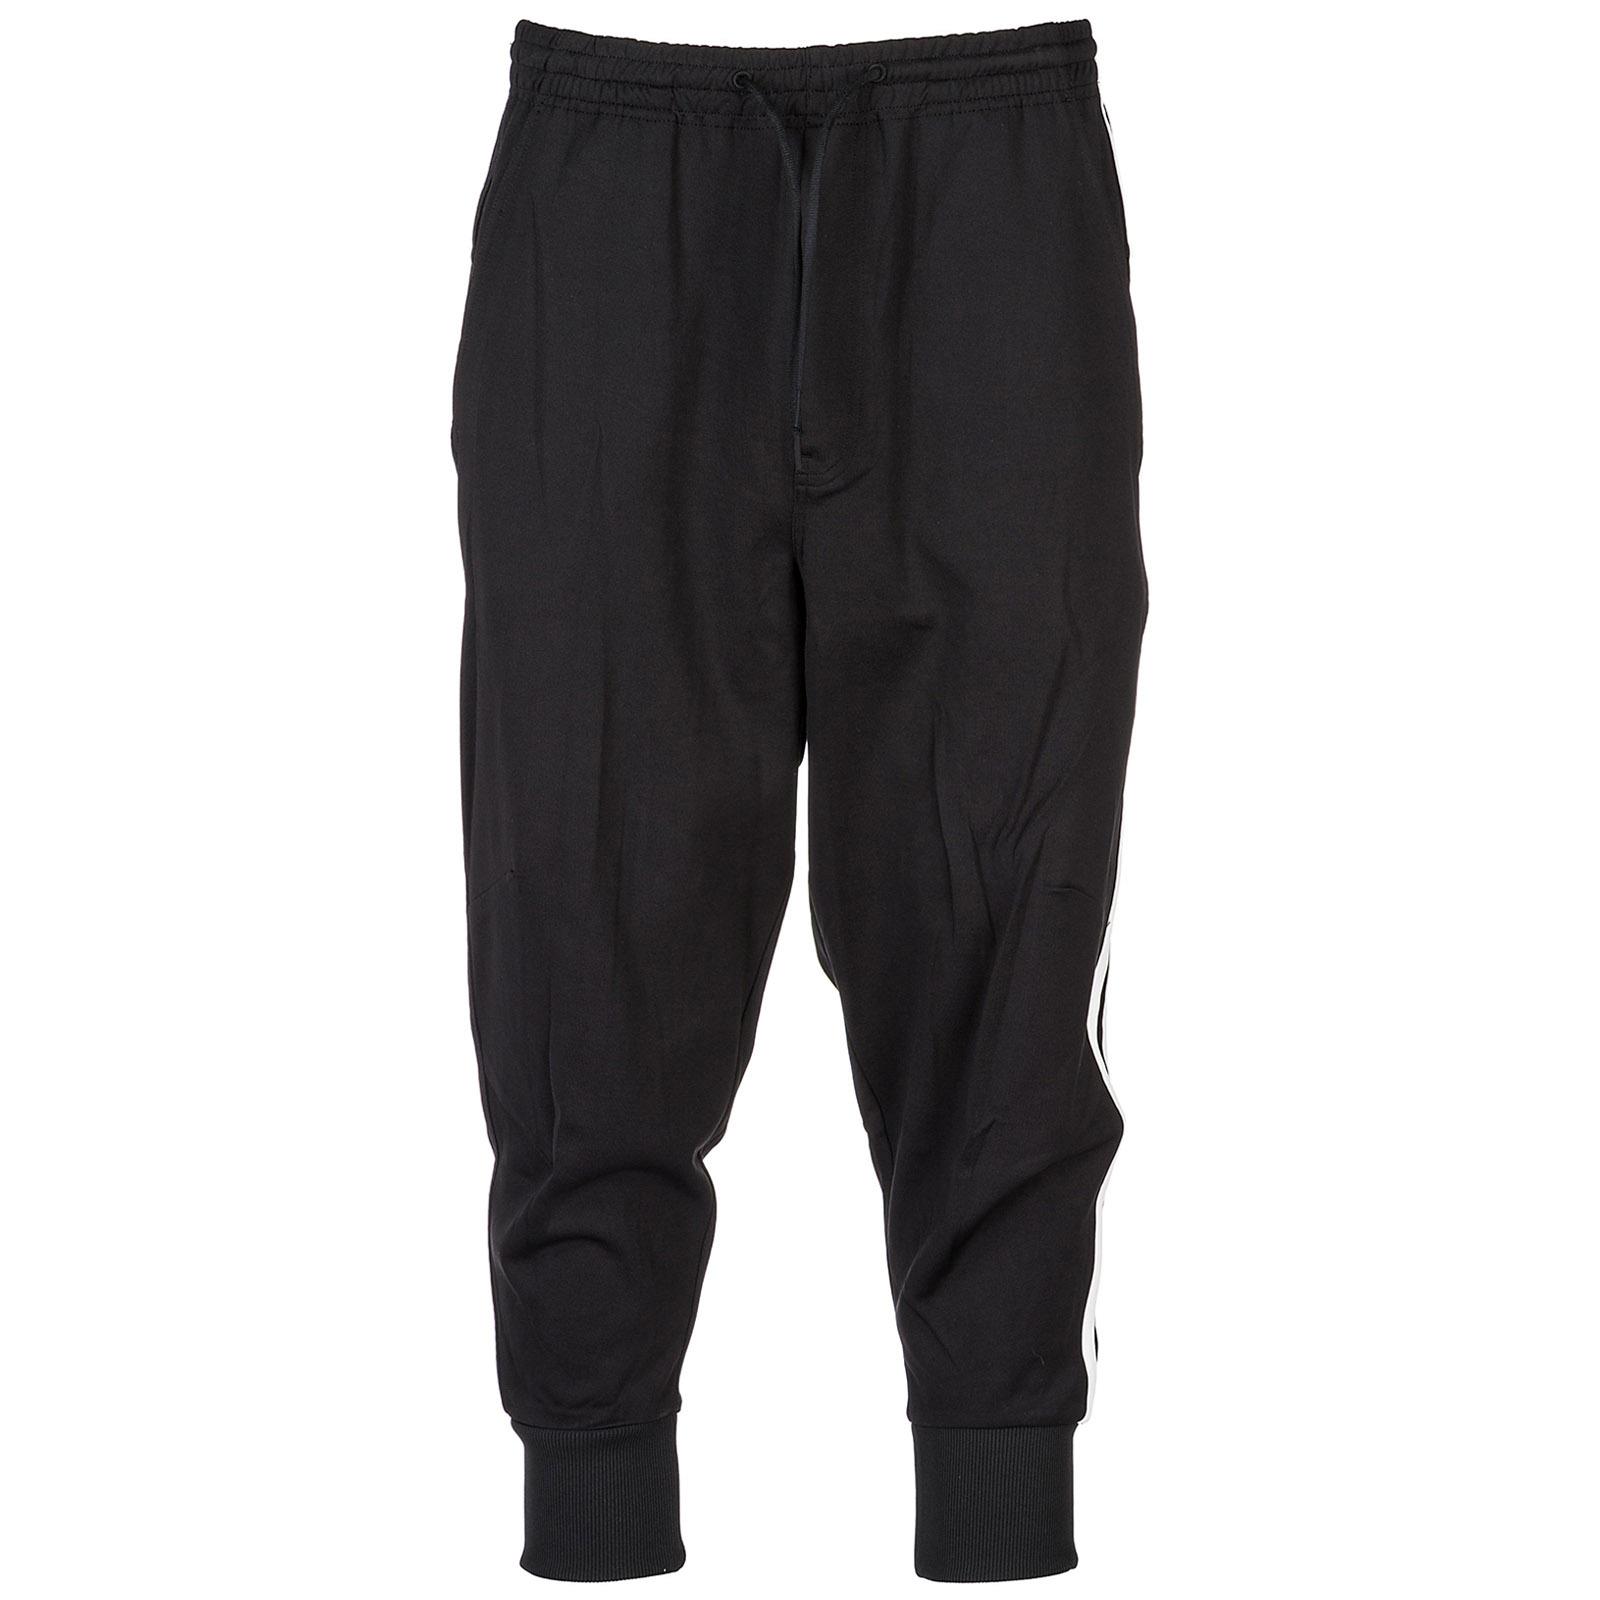 Pantaloni tuta uomo 3-stripes